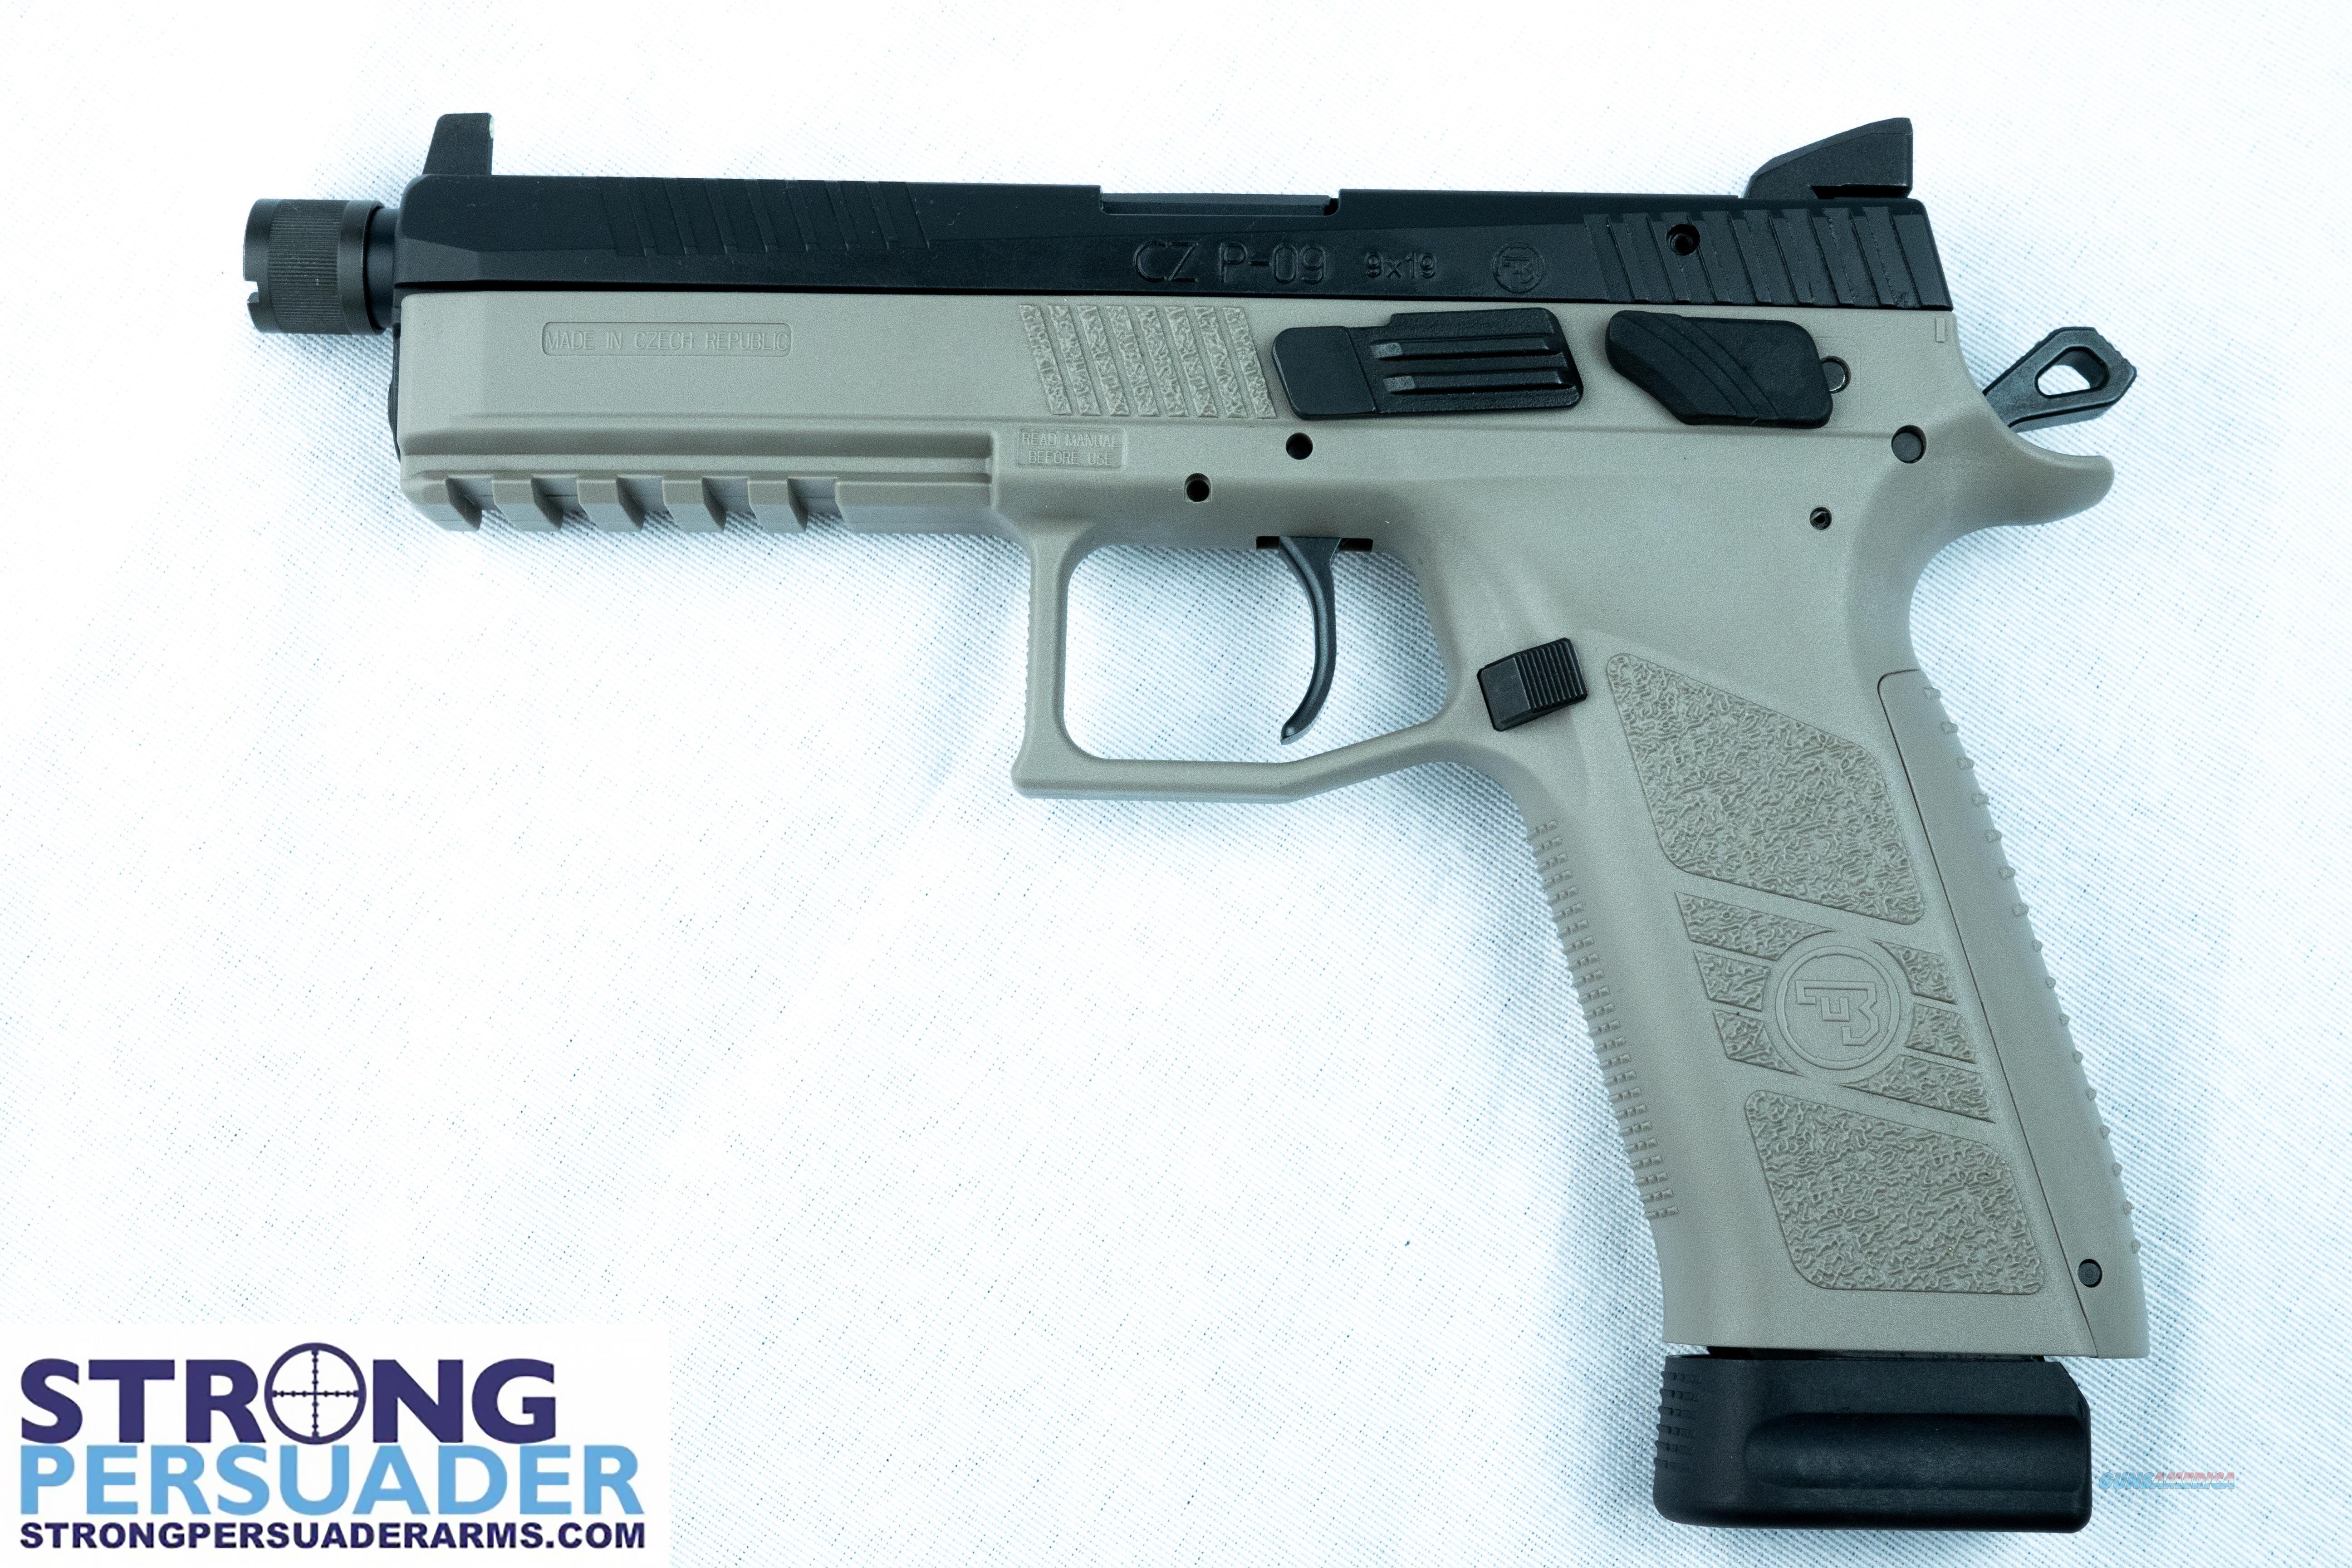 P-09 Urban Grey Suppressor Ready (91269)  Guns > Pistols > CZ Pistols